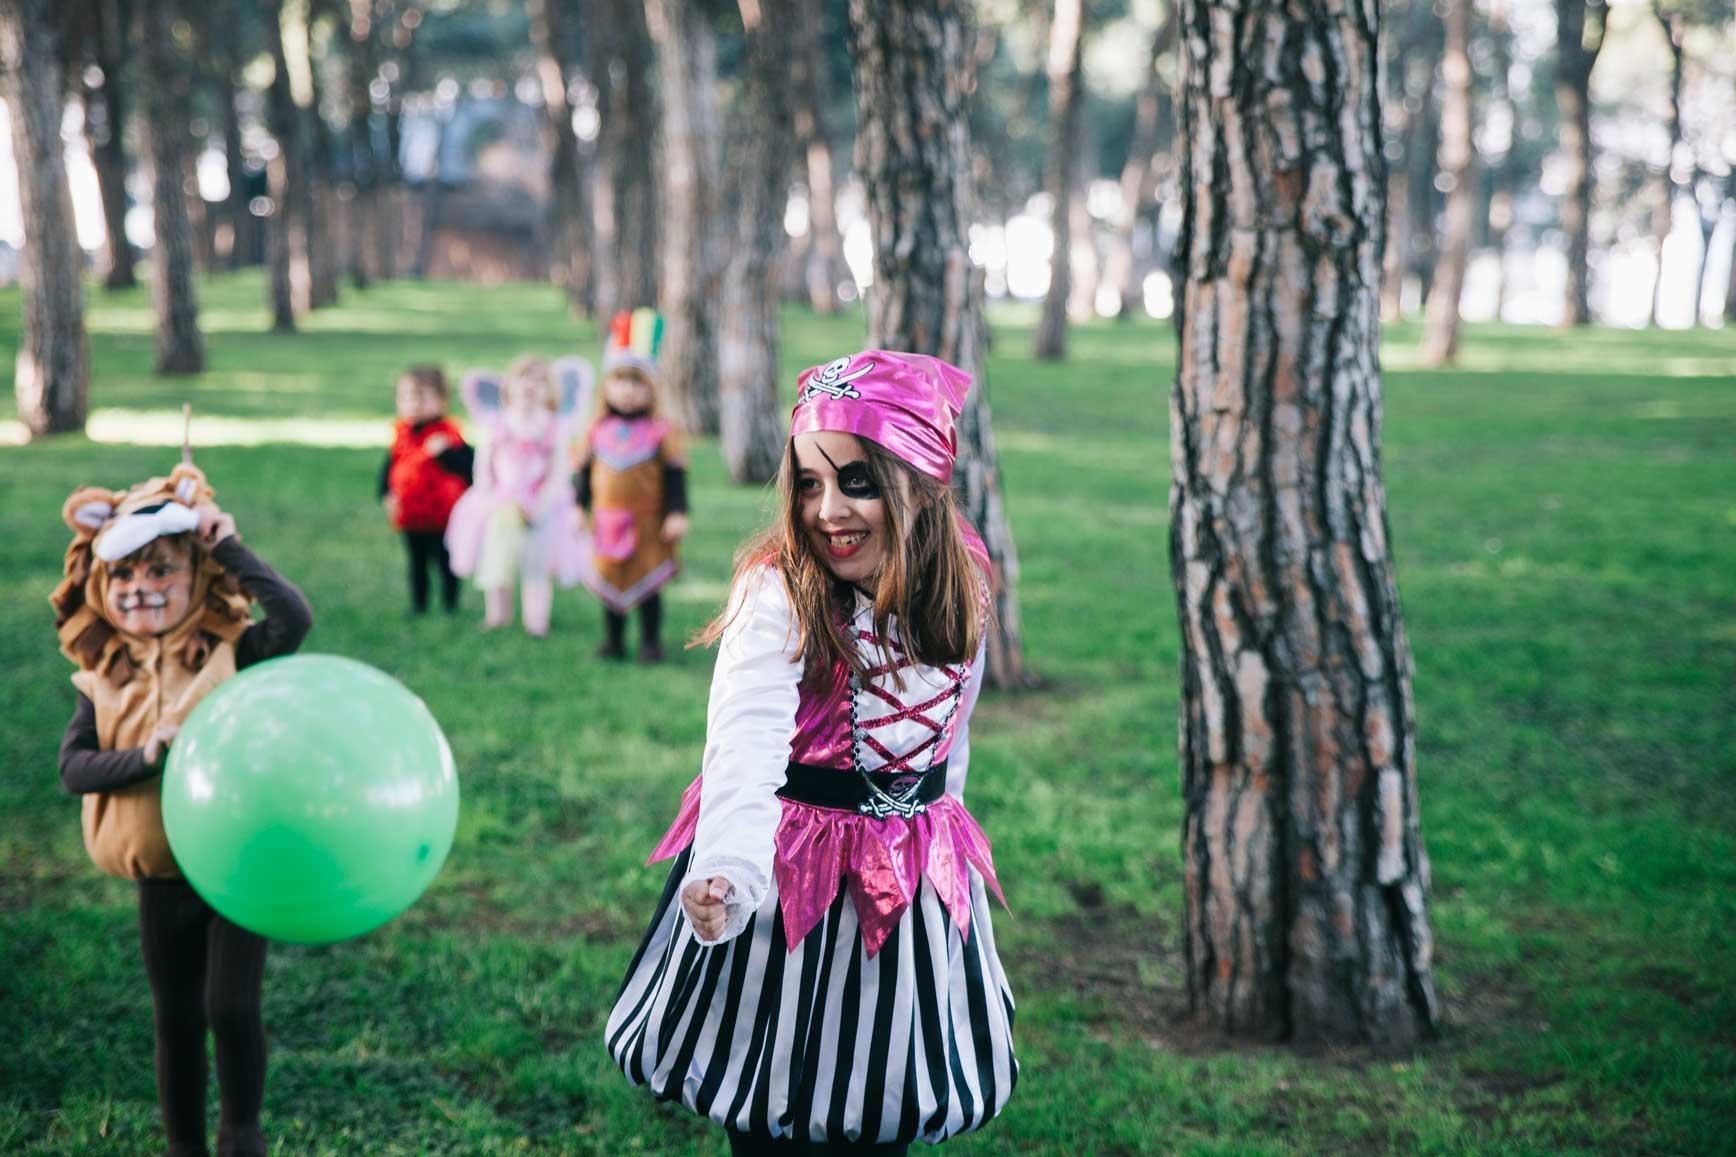 Carnaval-2017-el_corte_ingles-disfraz_pirata00 (1)